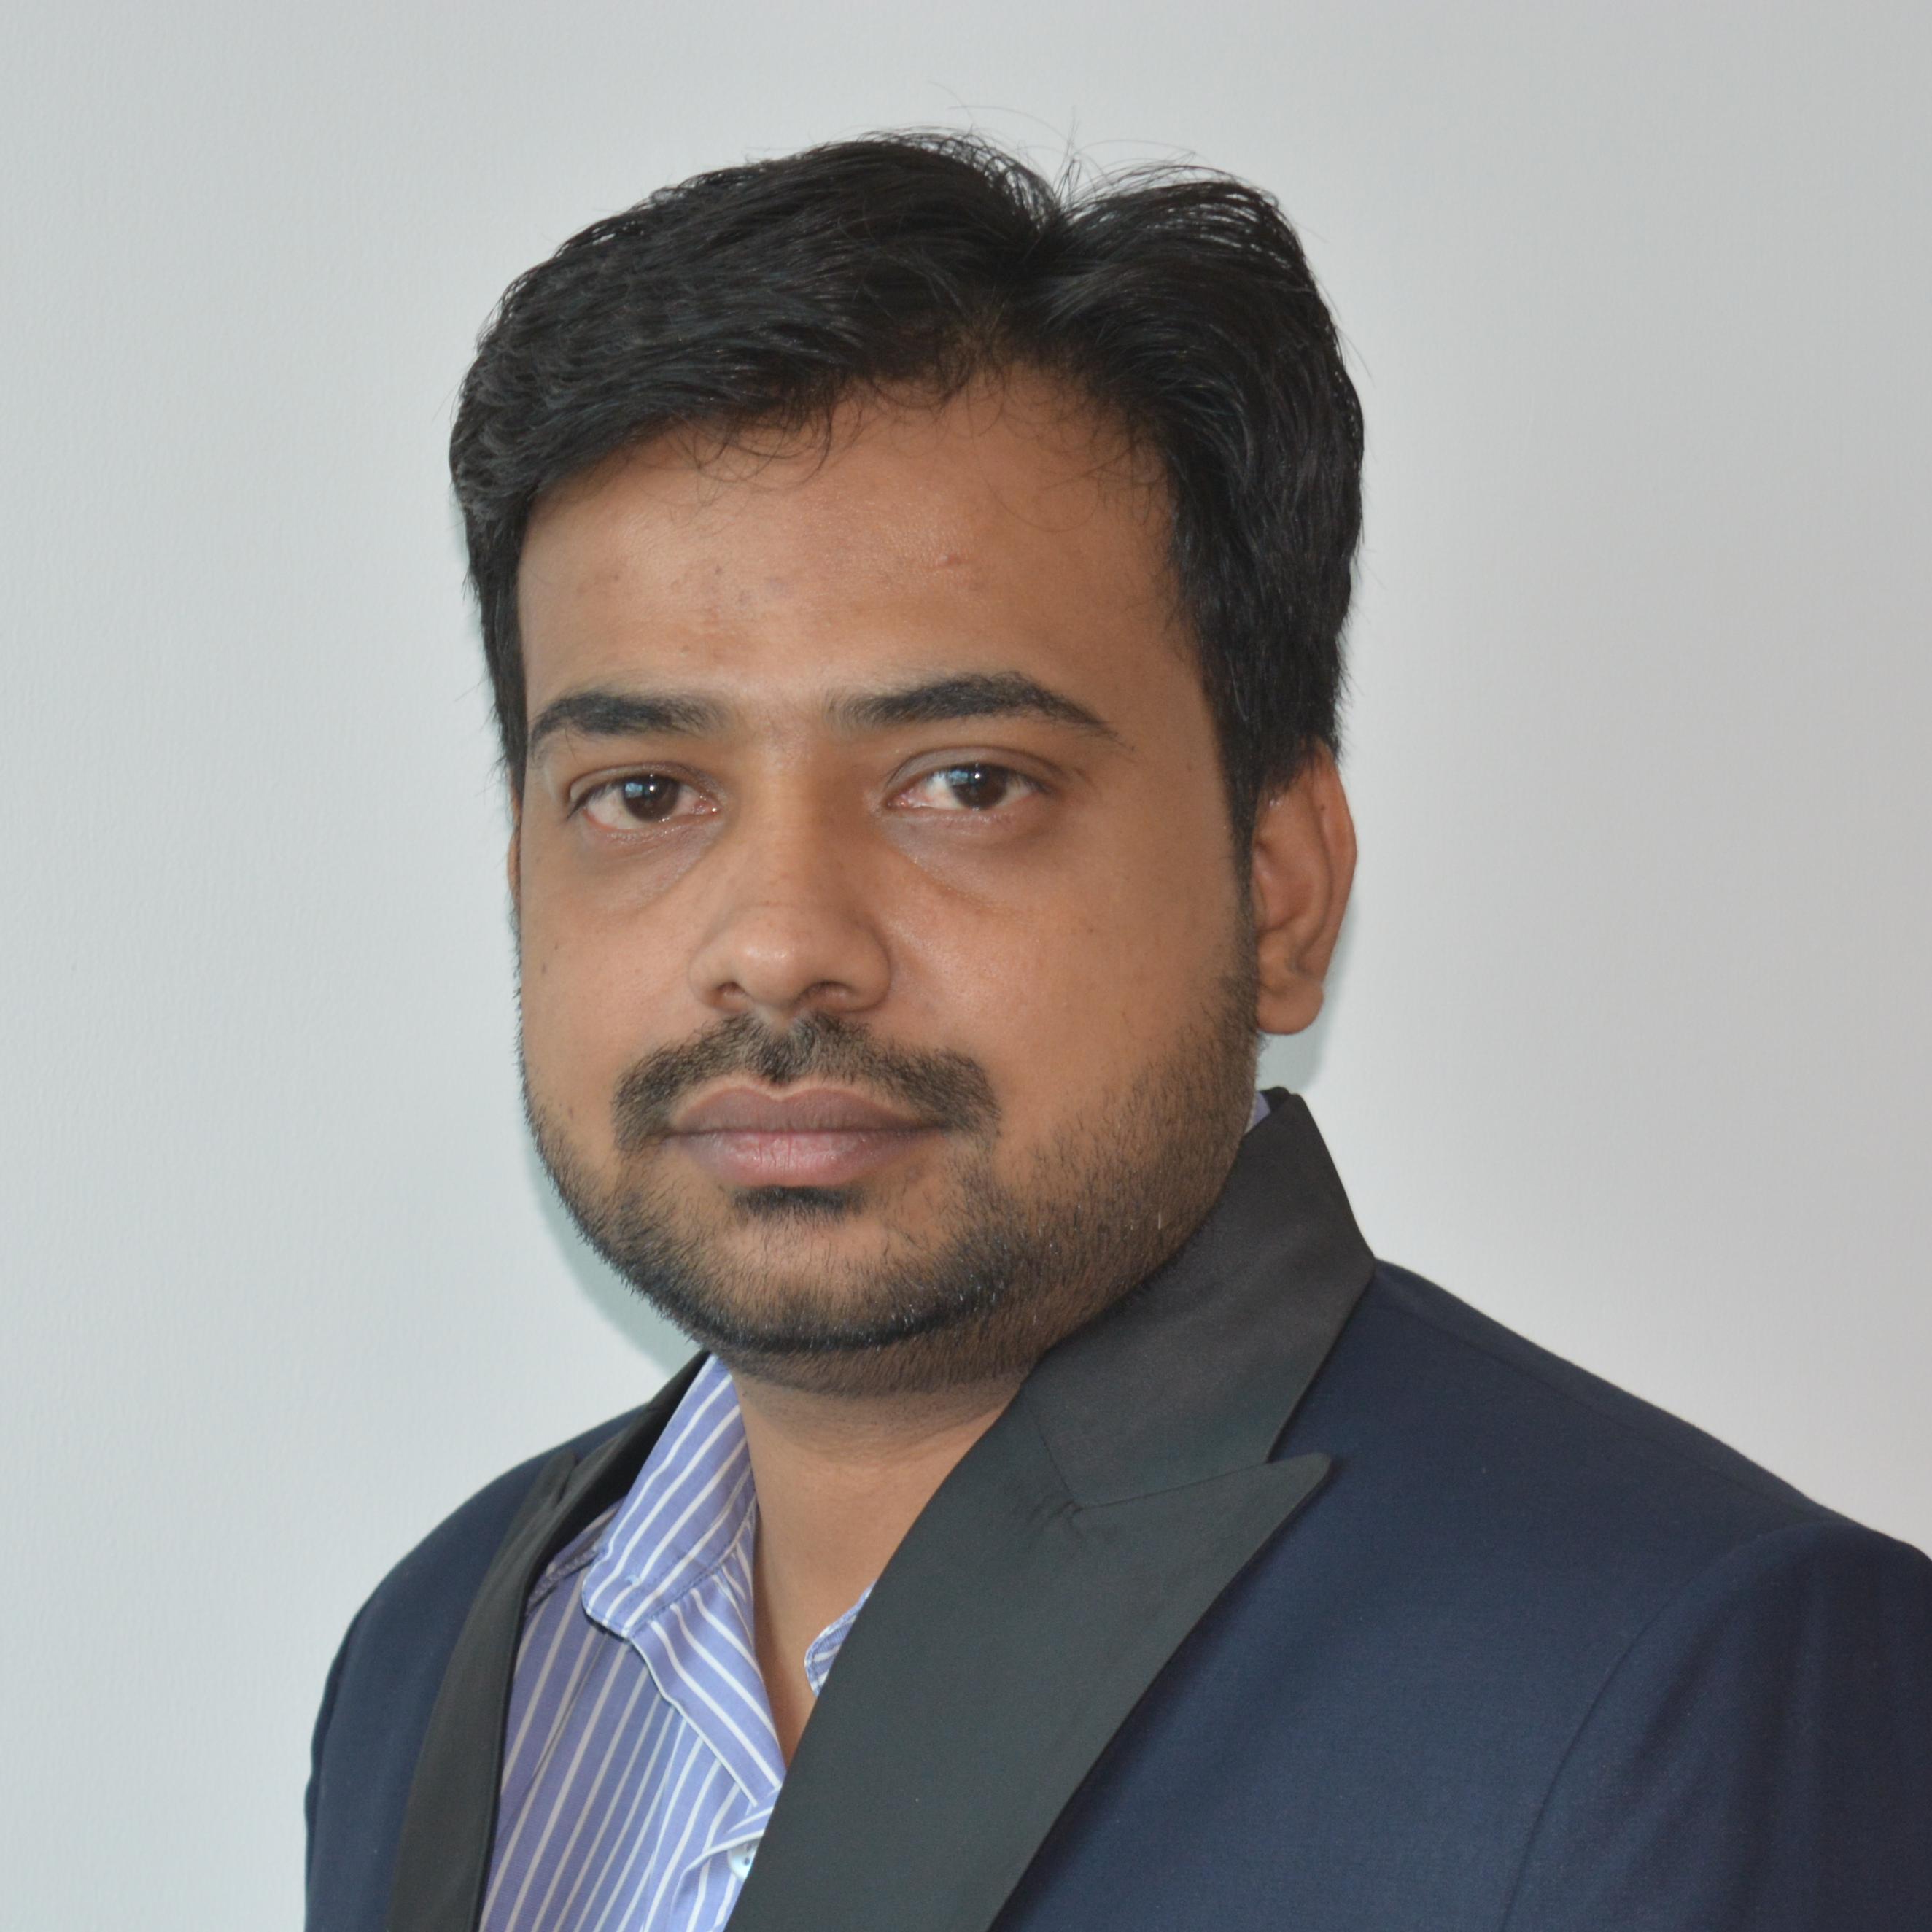 Avinay Kumar